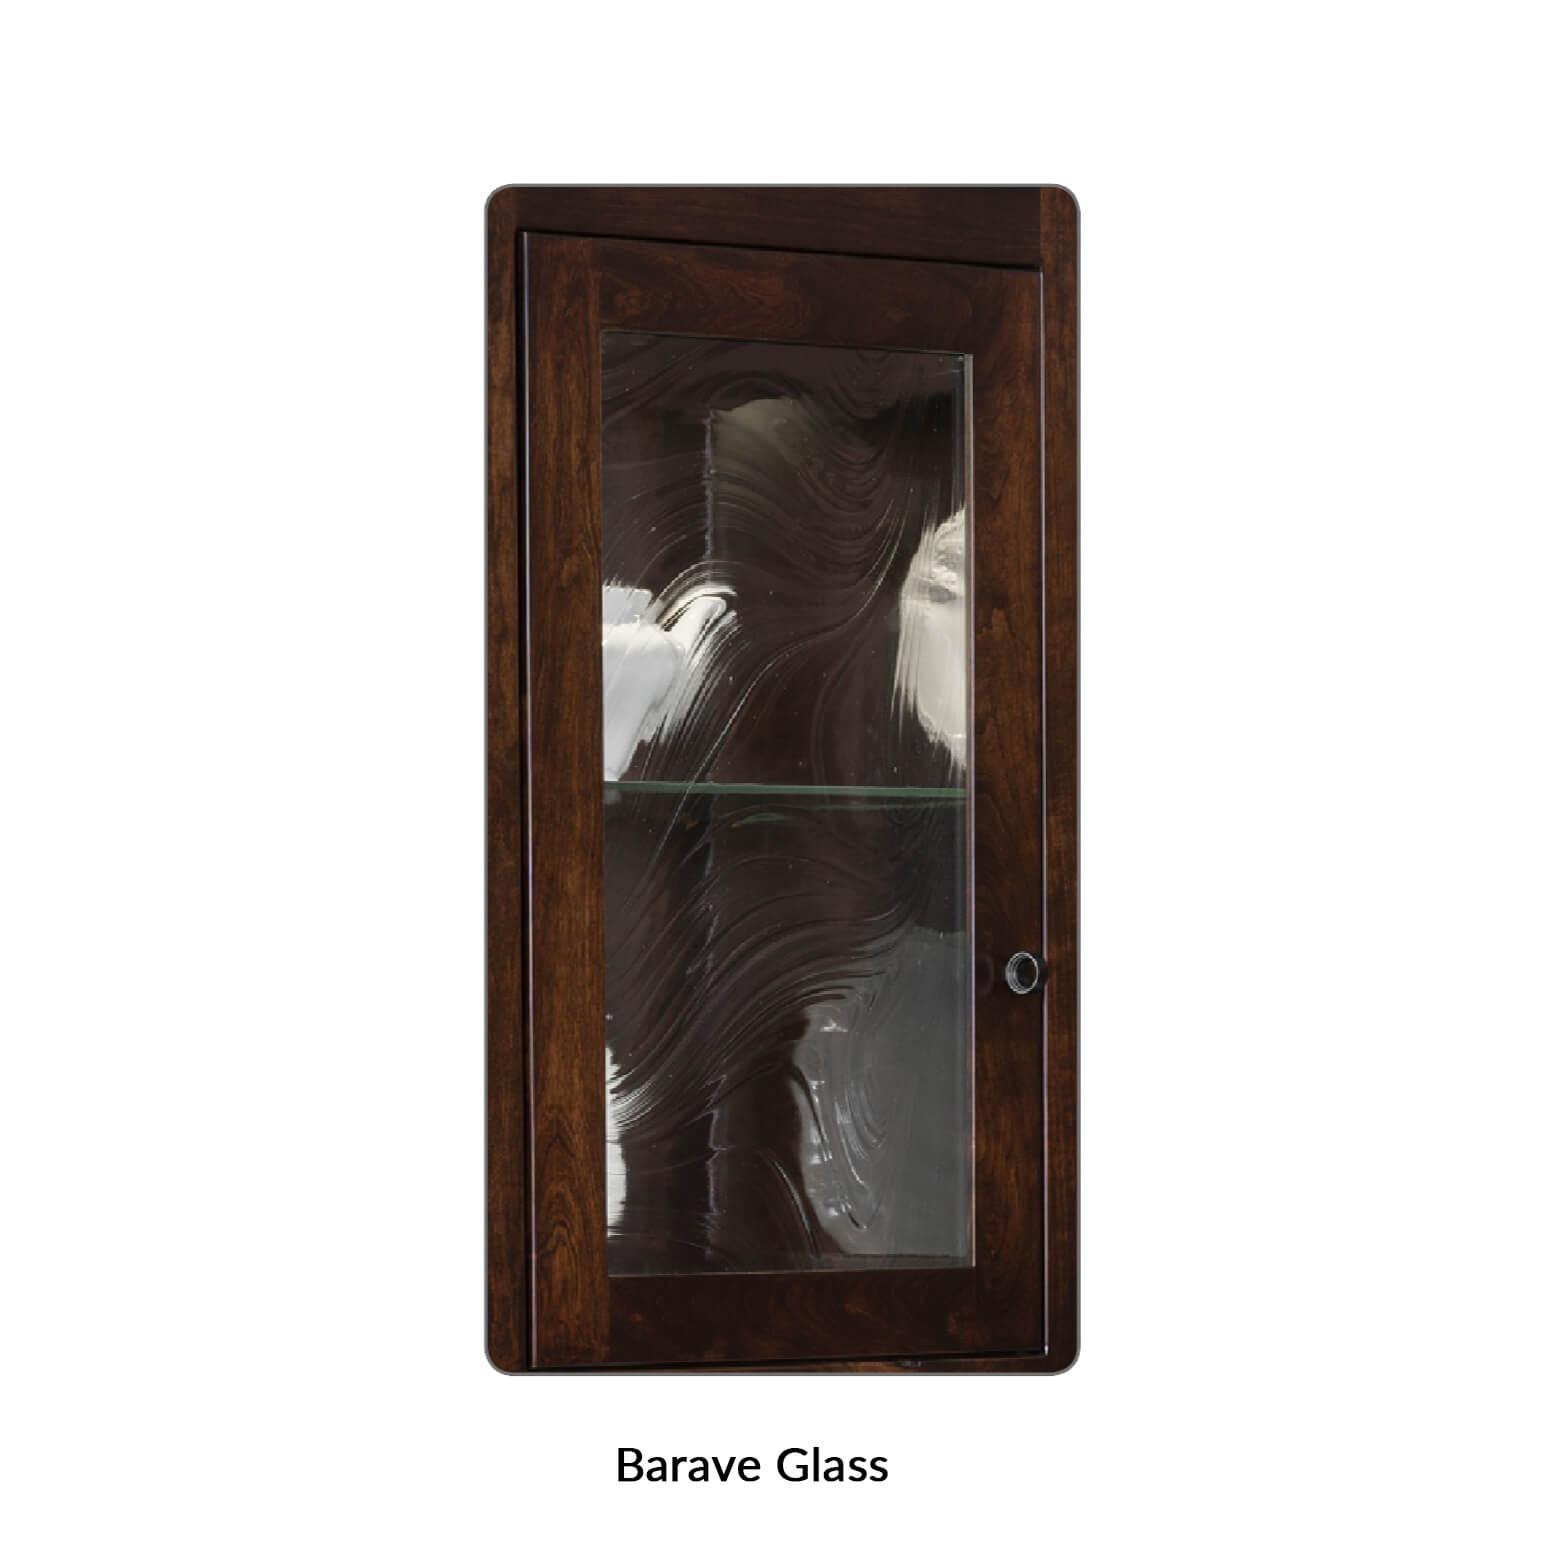 2-tf-barave-glass.jpg